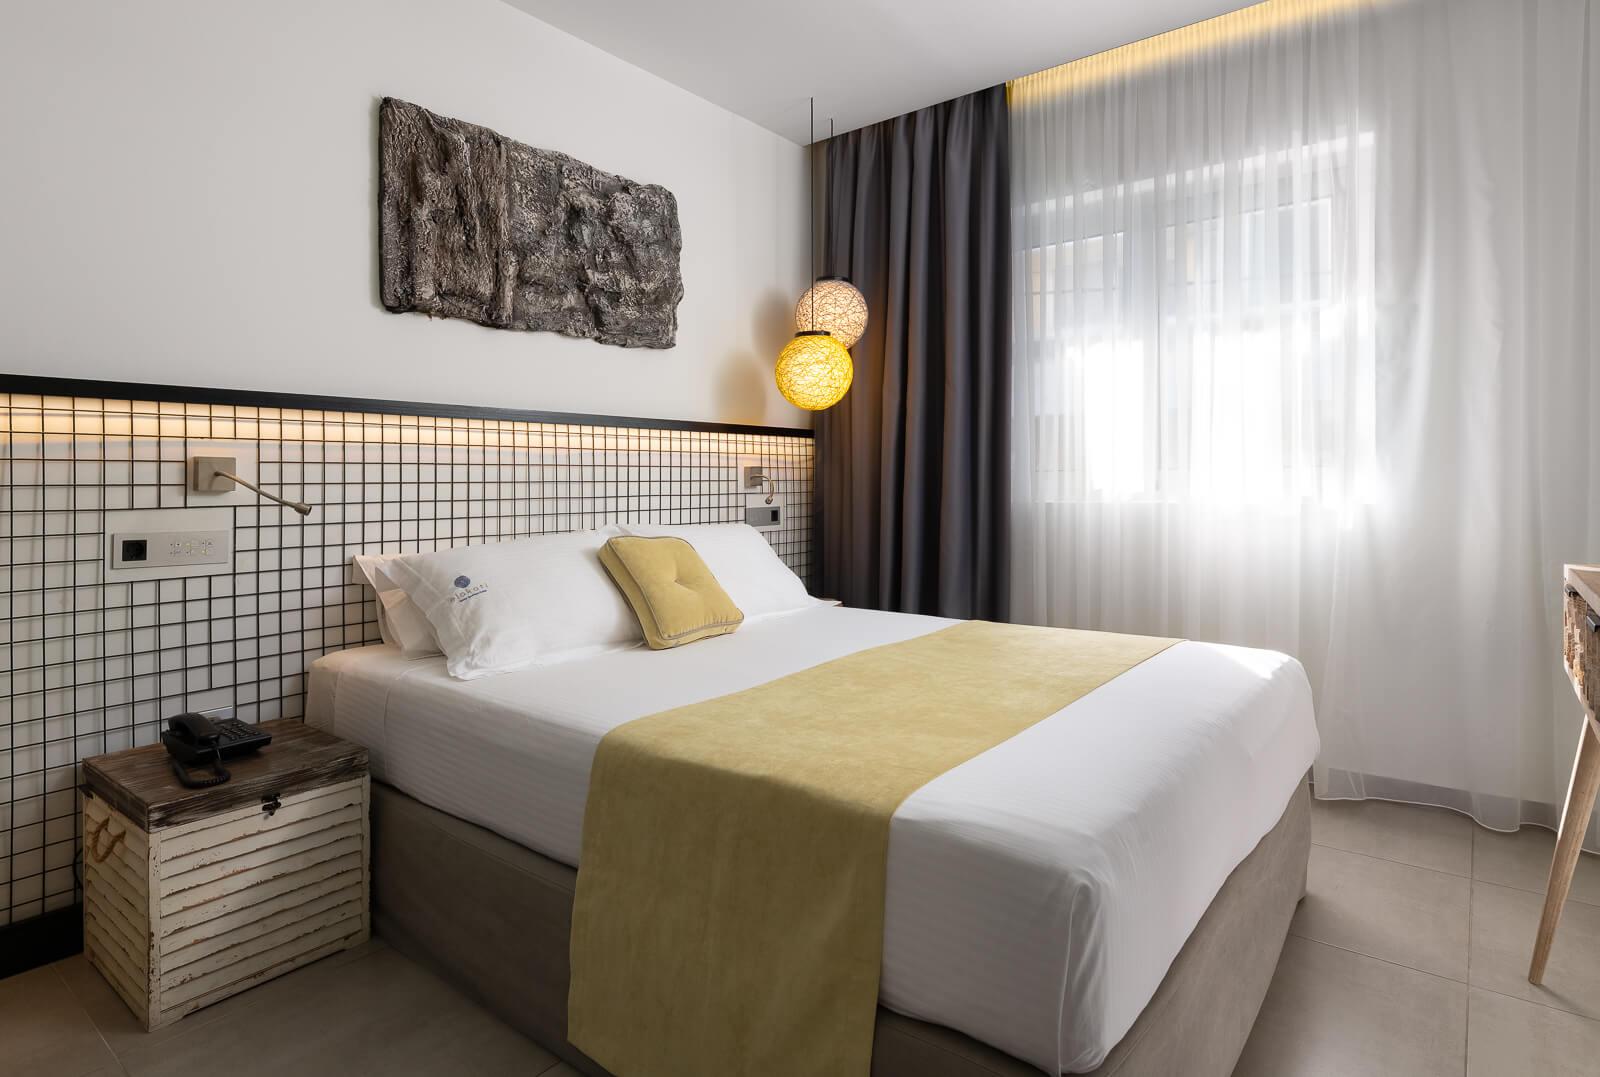 Aspalathos-Themed-Room-Elakati-Hotel-in-Rhodes-Greece